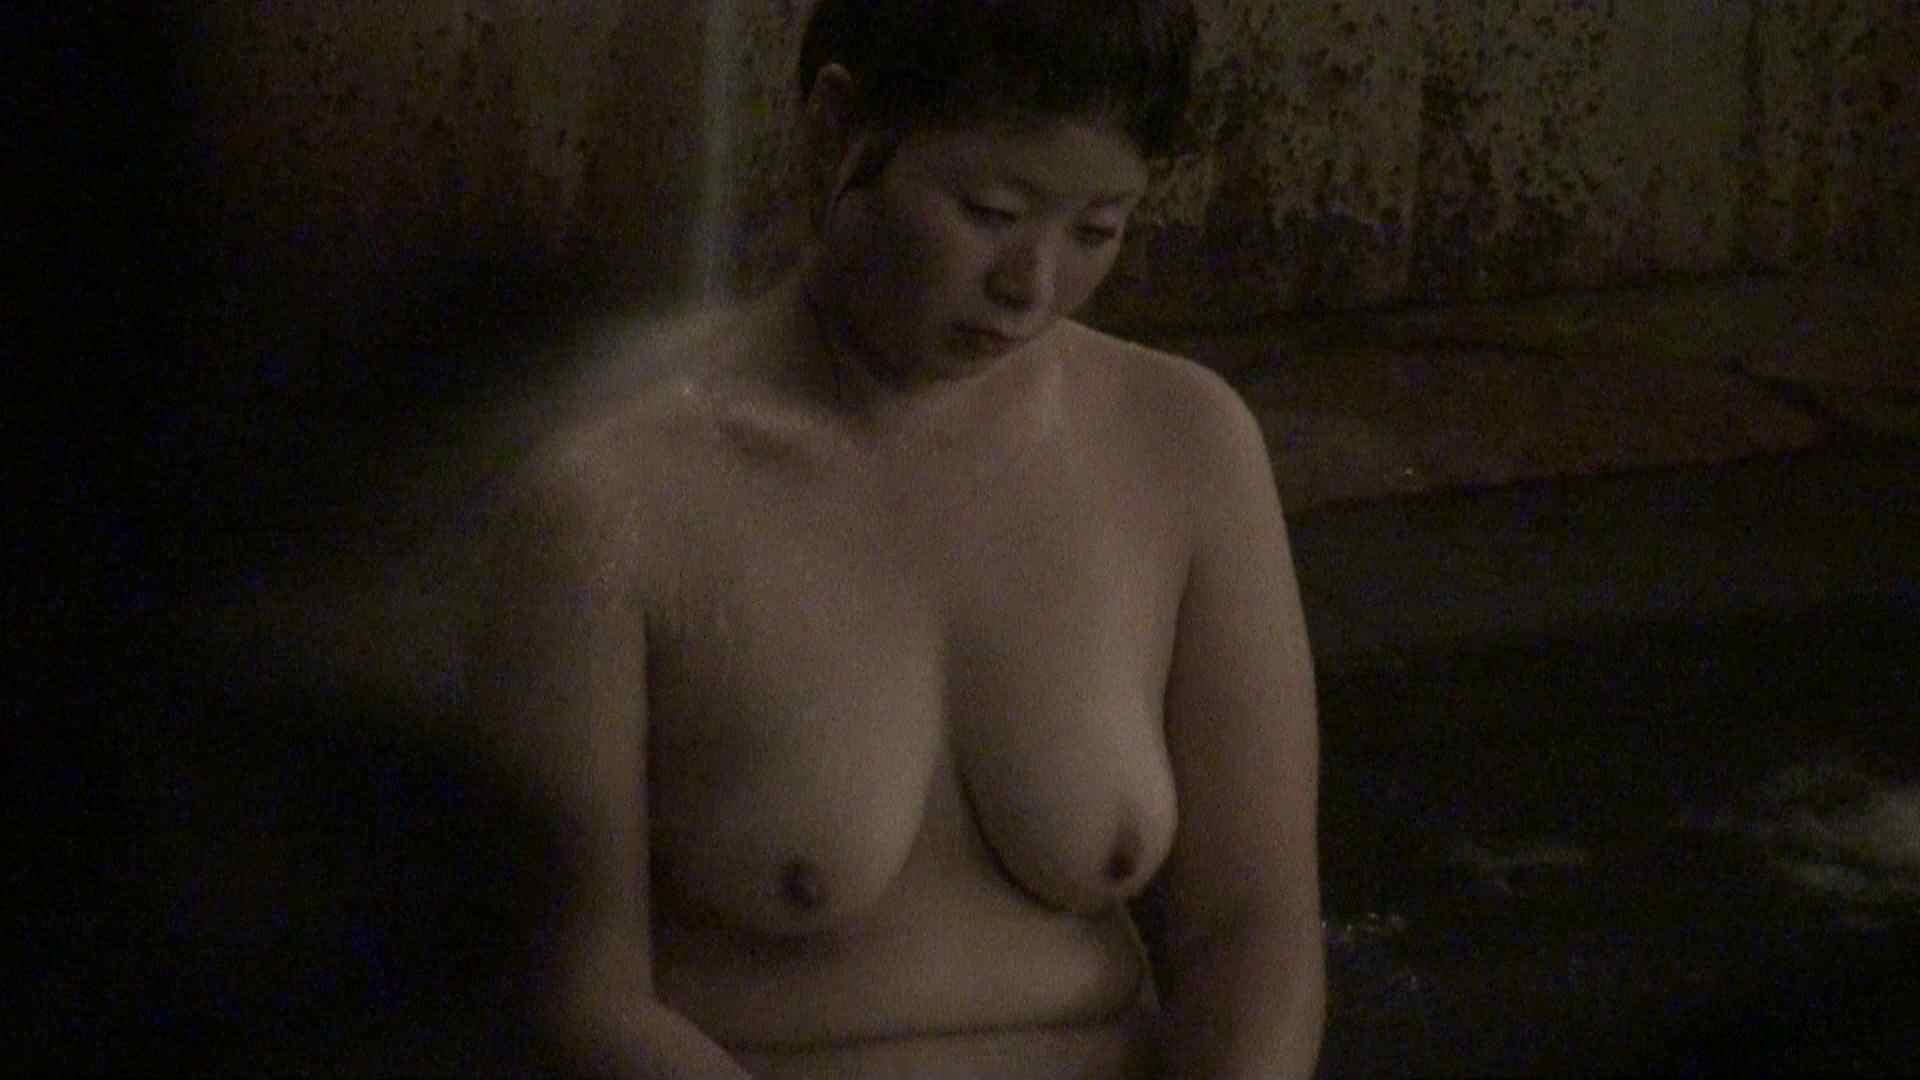 Aquaな露天風呂Vol.377 露天風呂突入   盗撮師作品  105pic 58